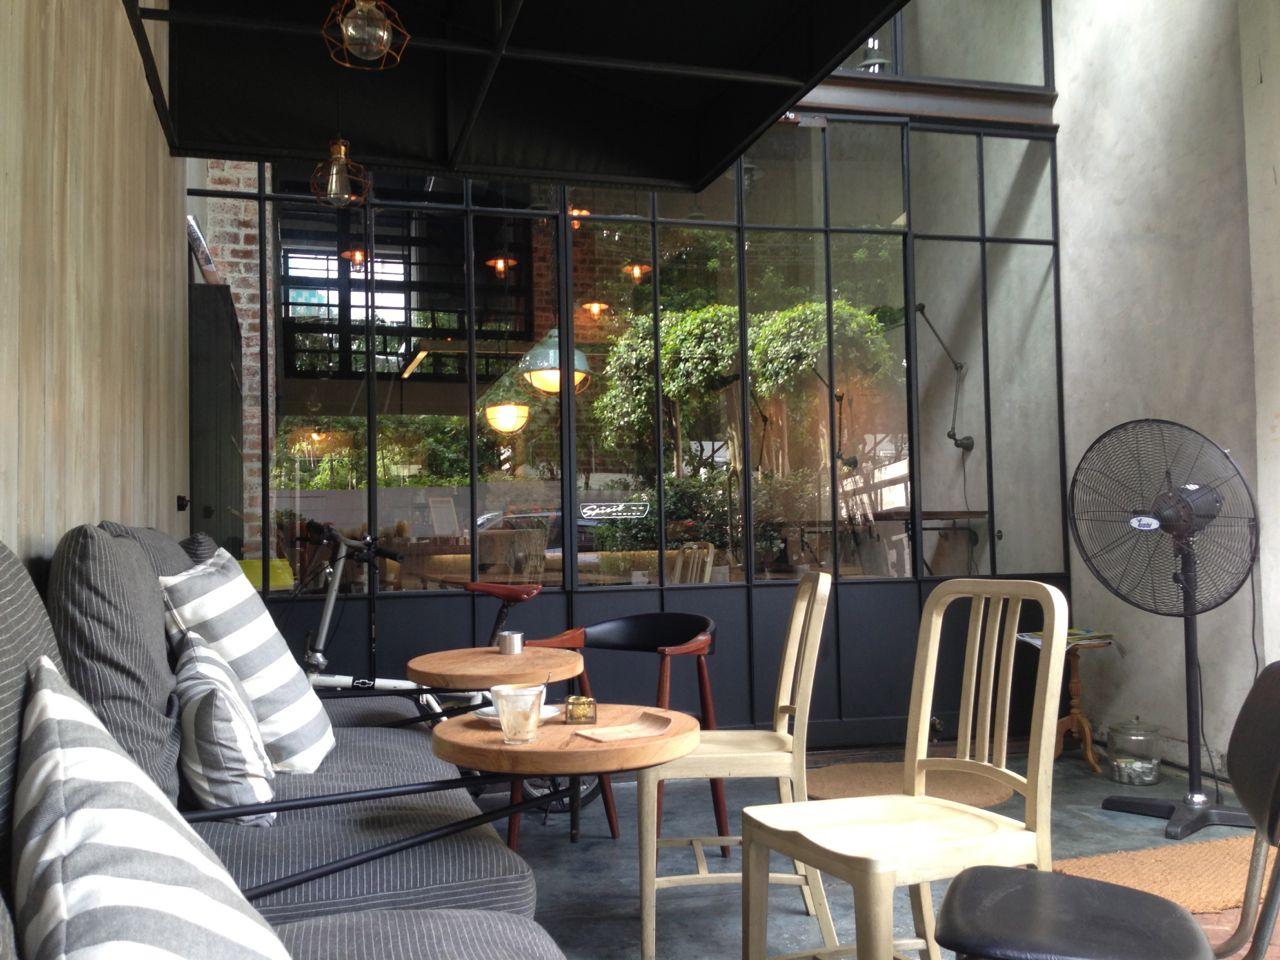 Review ร้านกาแฟเล็กๆ ชื่อ Casa Lapin   Pantip